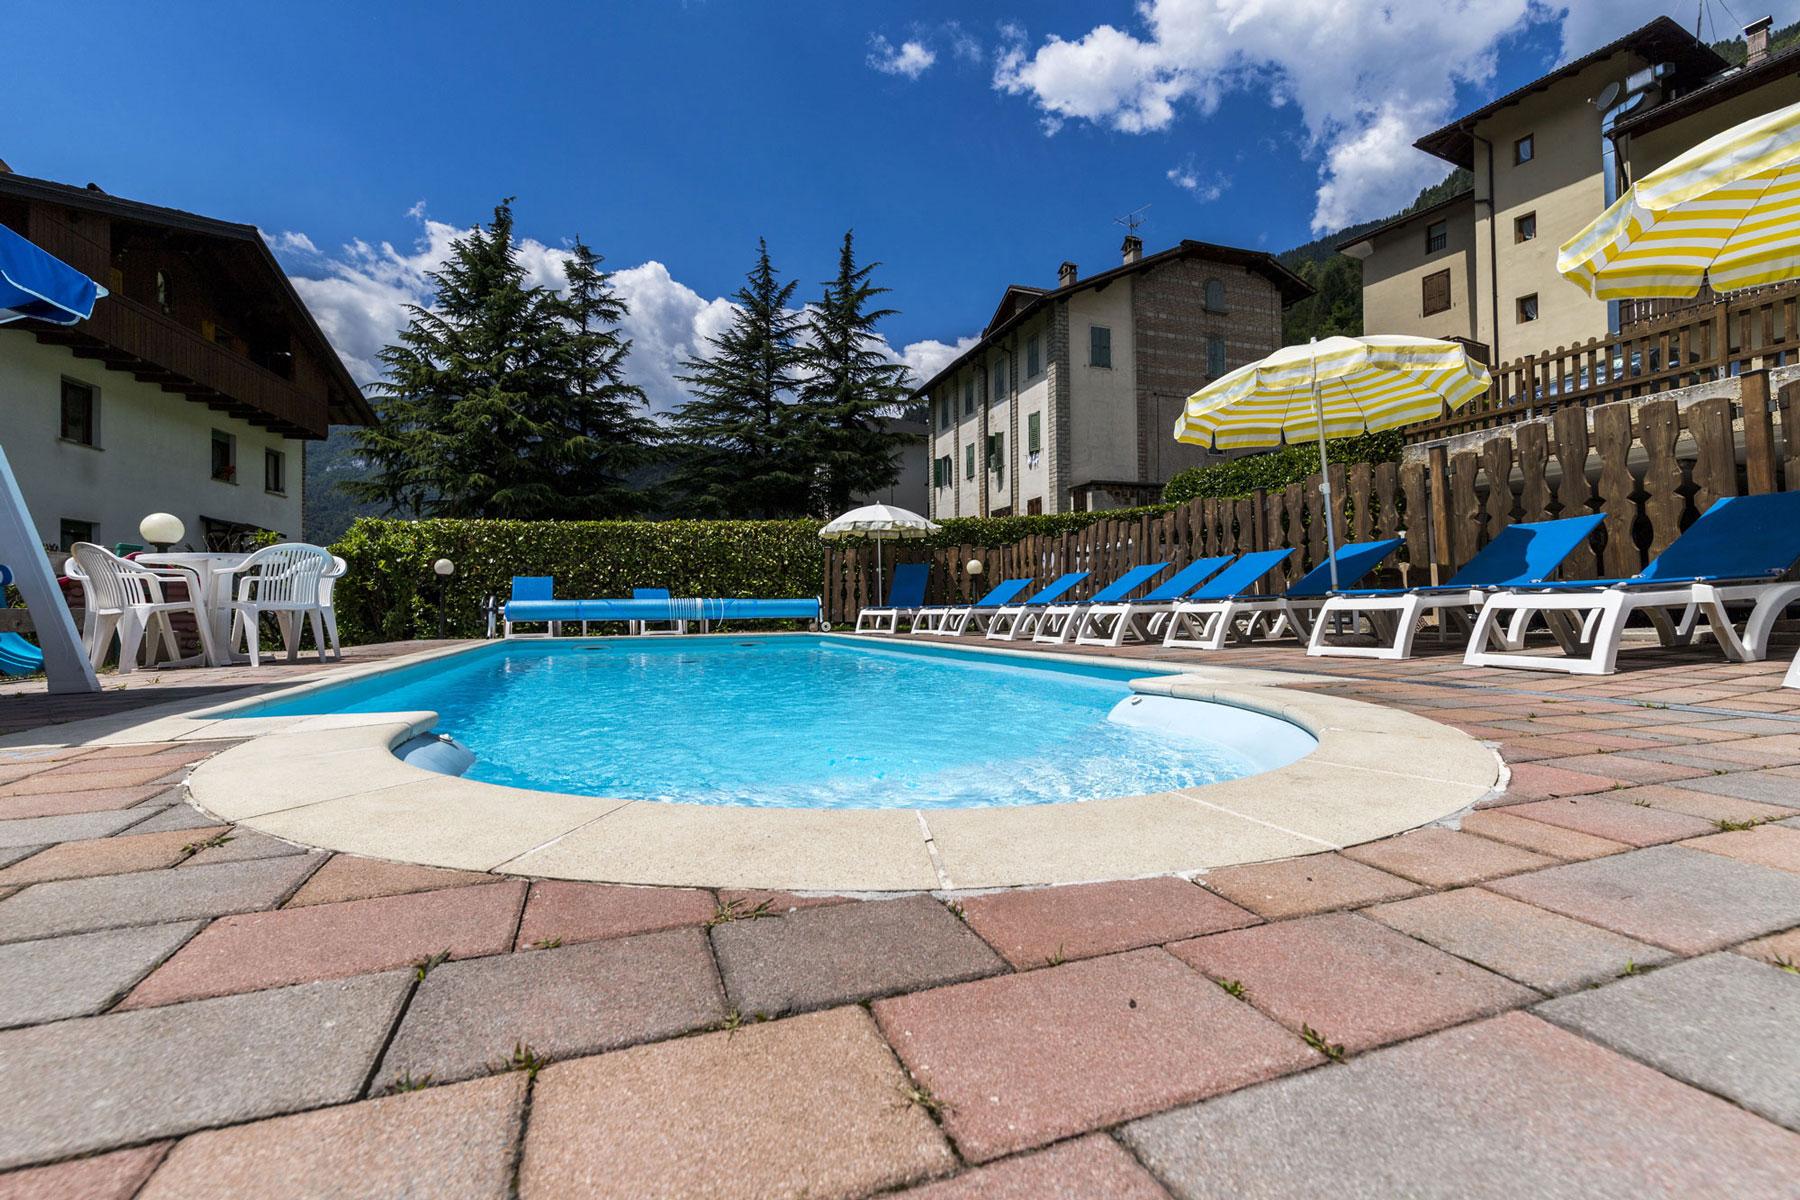 AlBivio-piscina-6